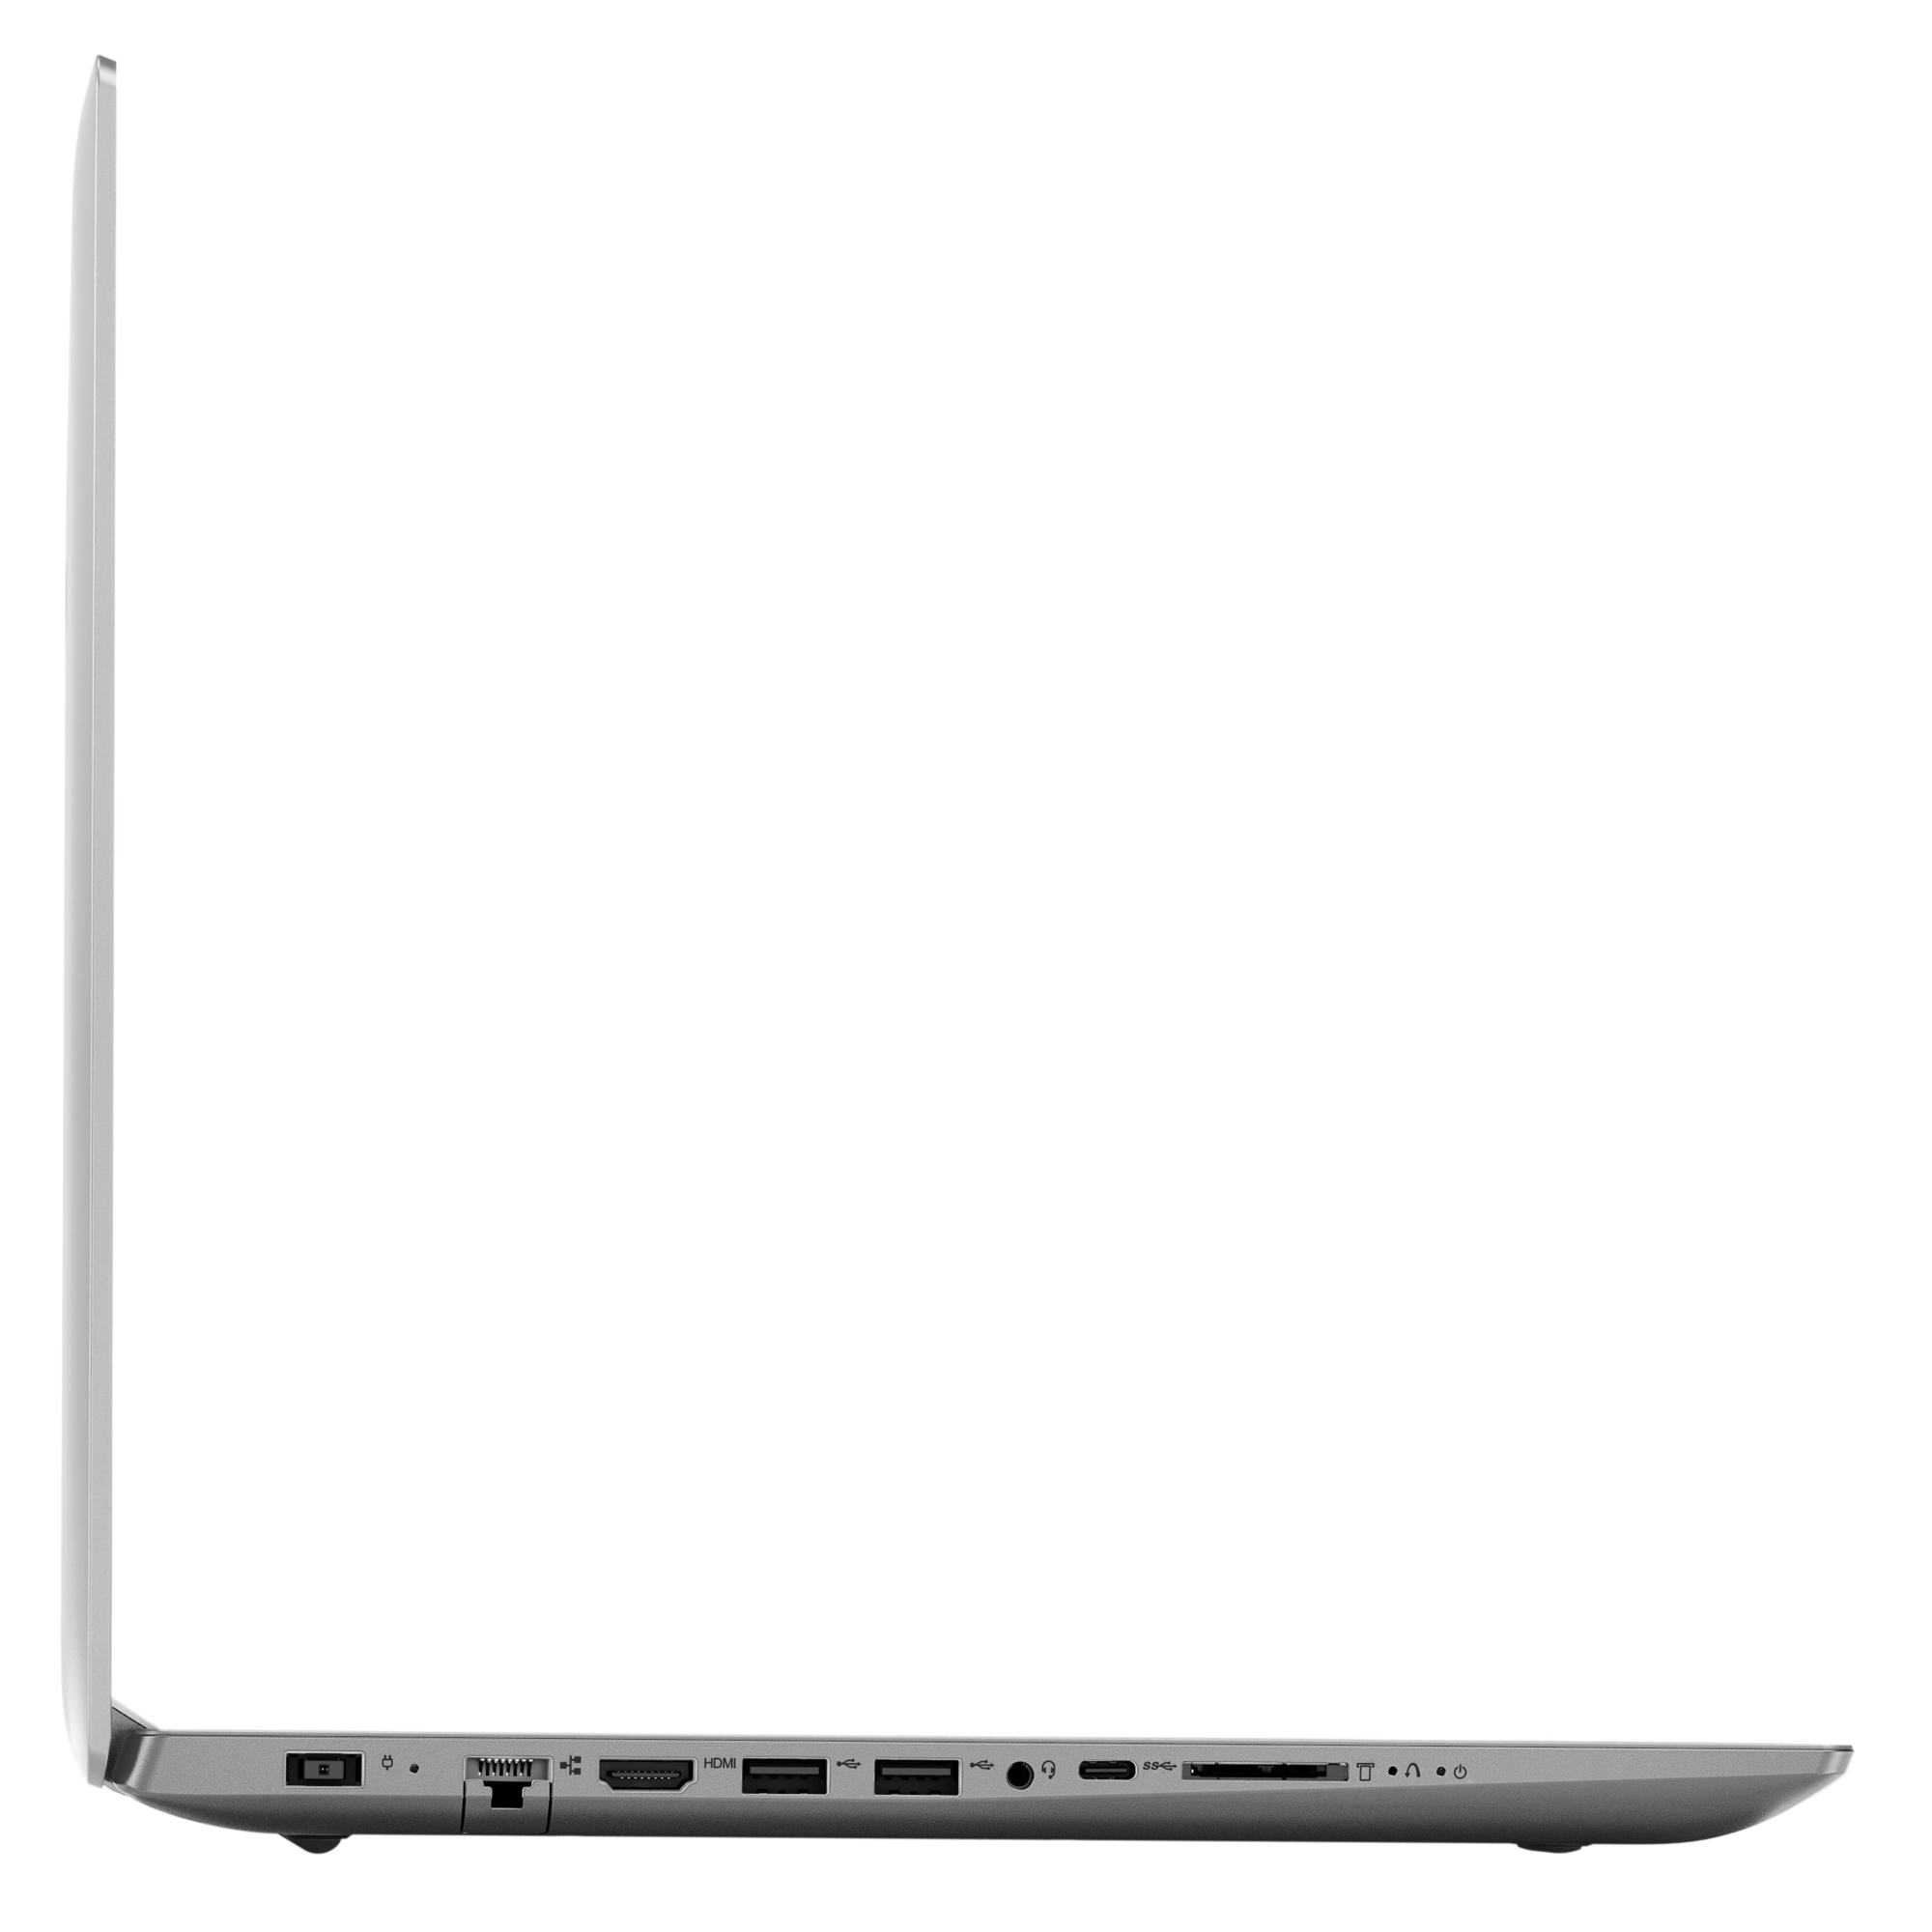 Фото  Ноутбук Lenovo ideapad 330-15IKB Platinum Grey (81DE02F4RU)